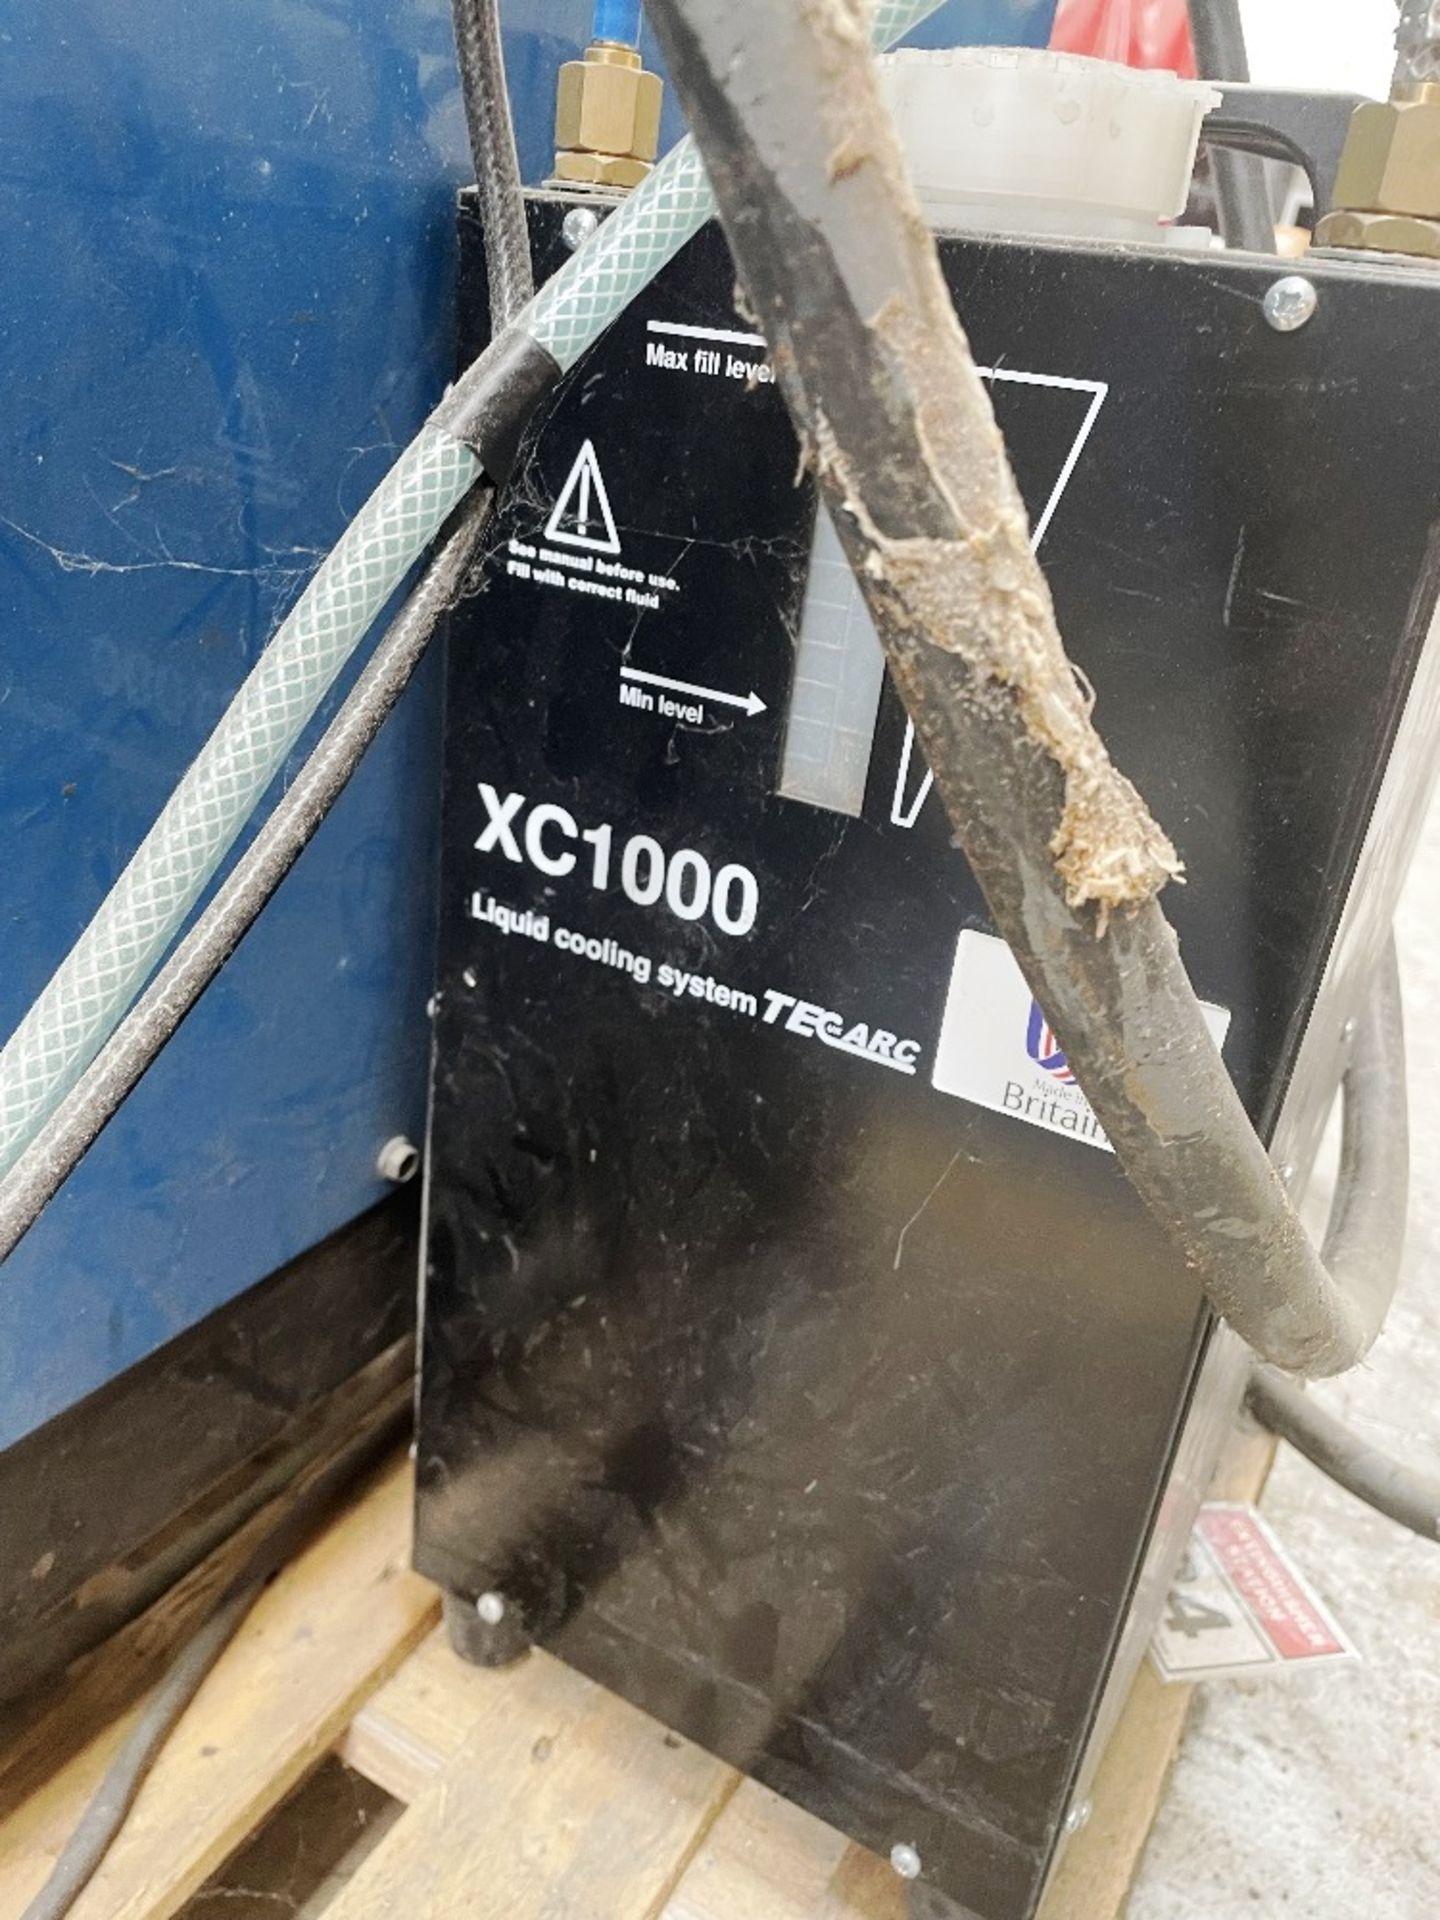 Miller Syncrowave 250 Tig Welder w/ TecArc XC1000 Water Cooler - Image 3 of 4